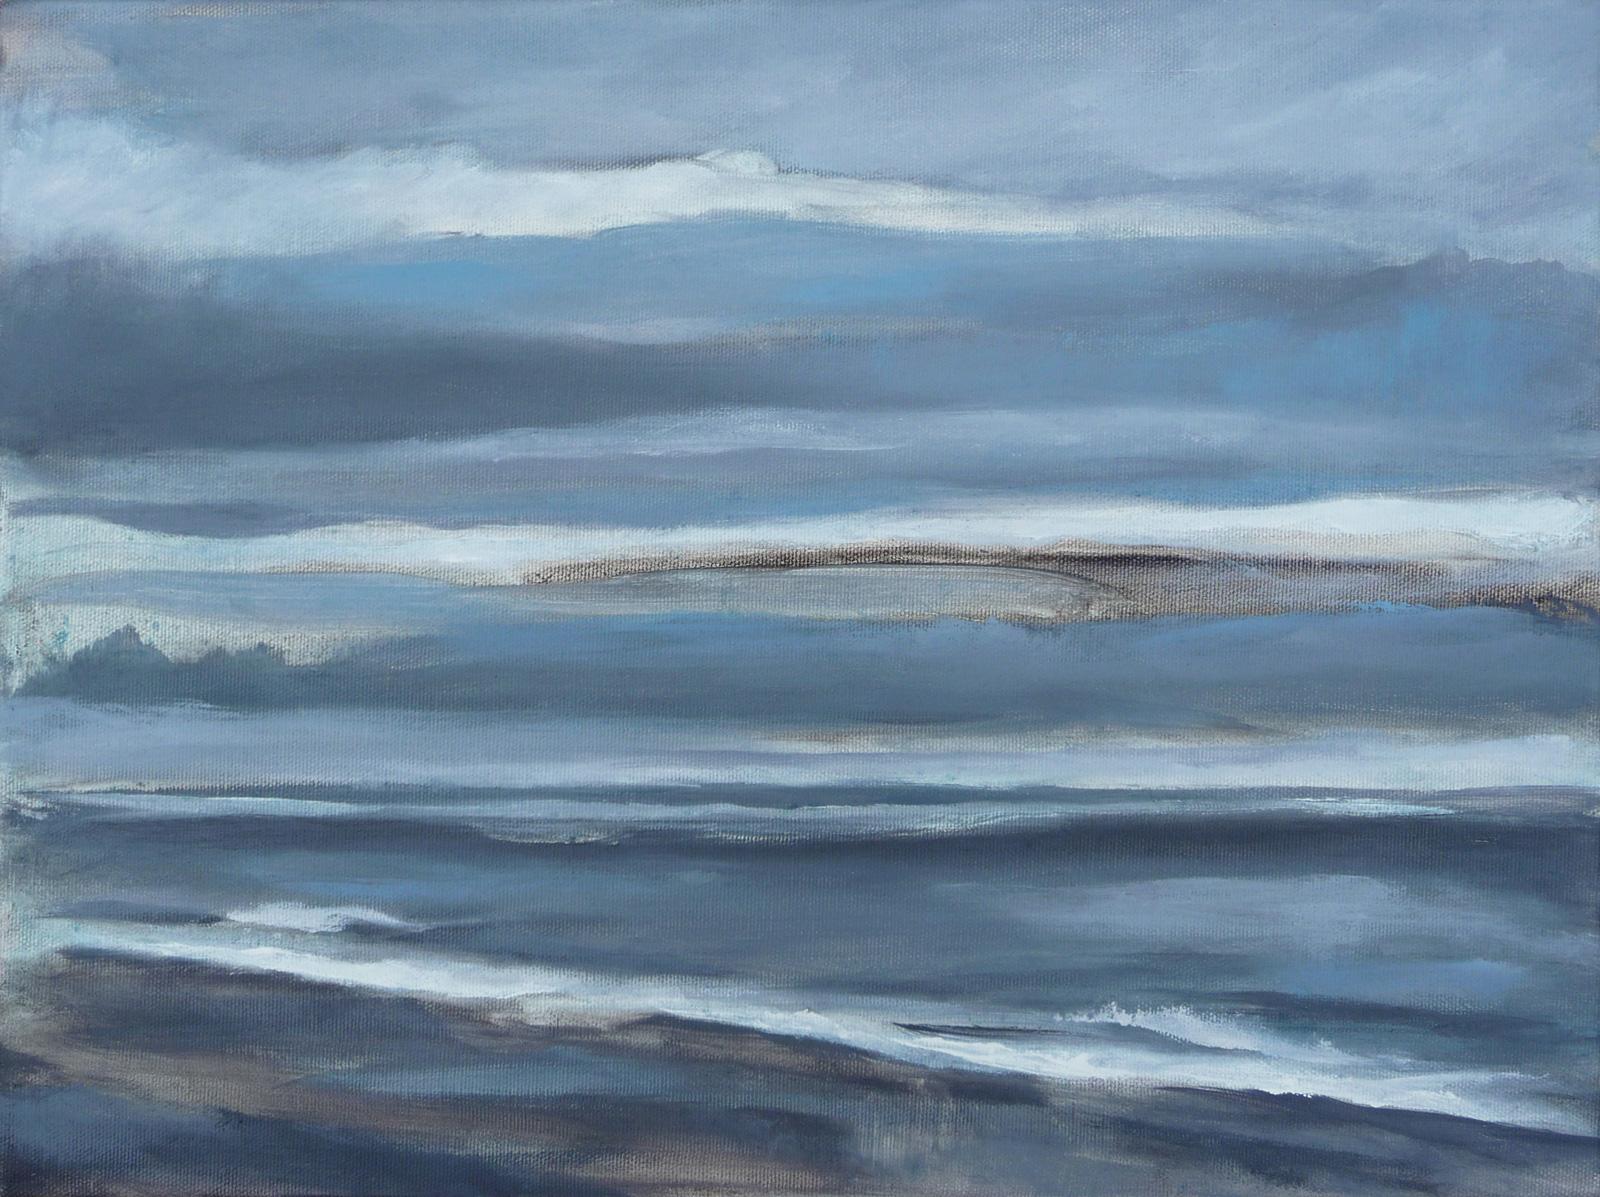 Shoreline II , 2018. Oil on canvas. 12x16 inches